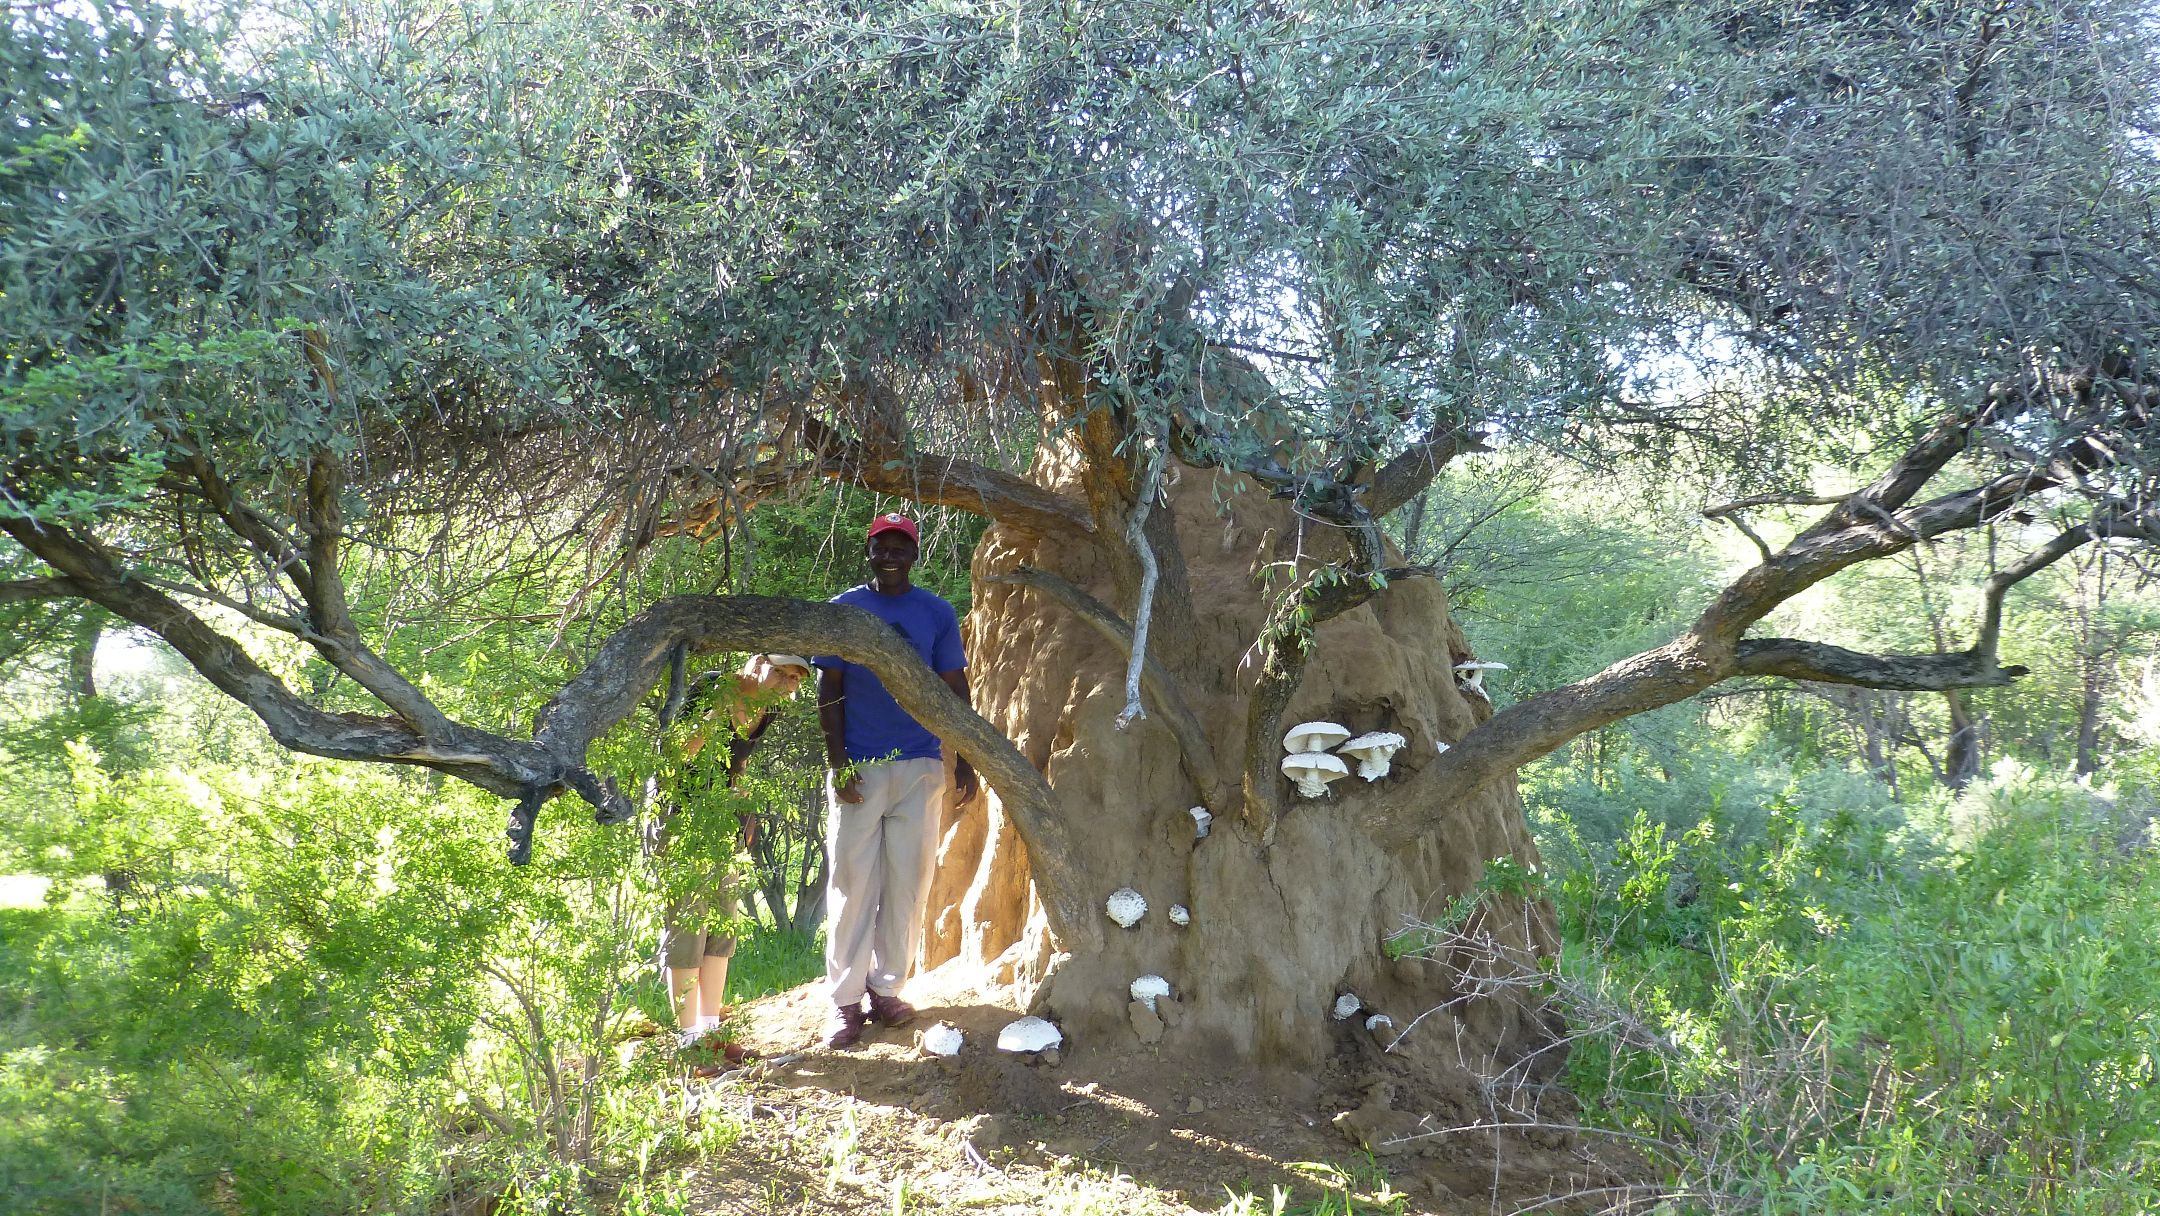 Termitenhügel mit Omayova